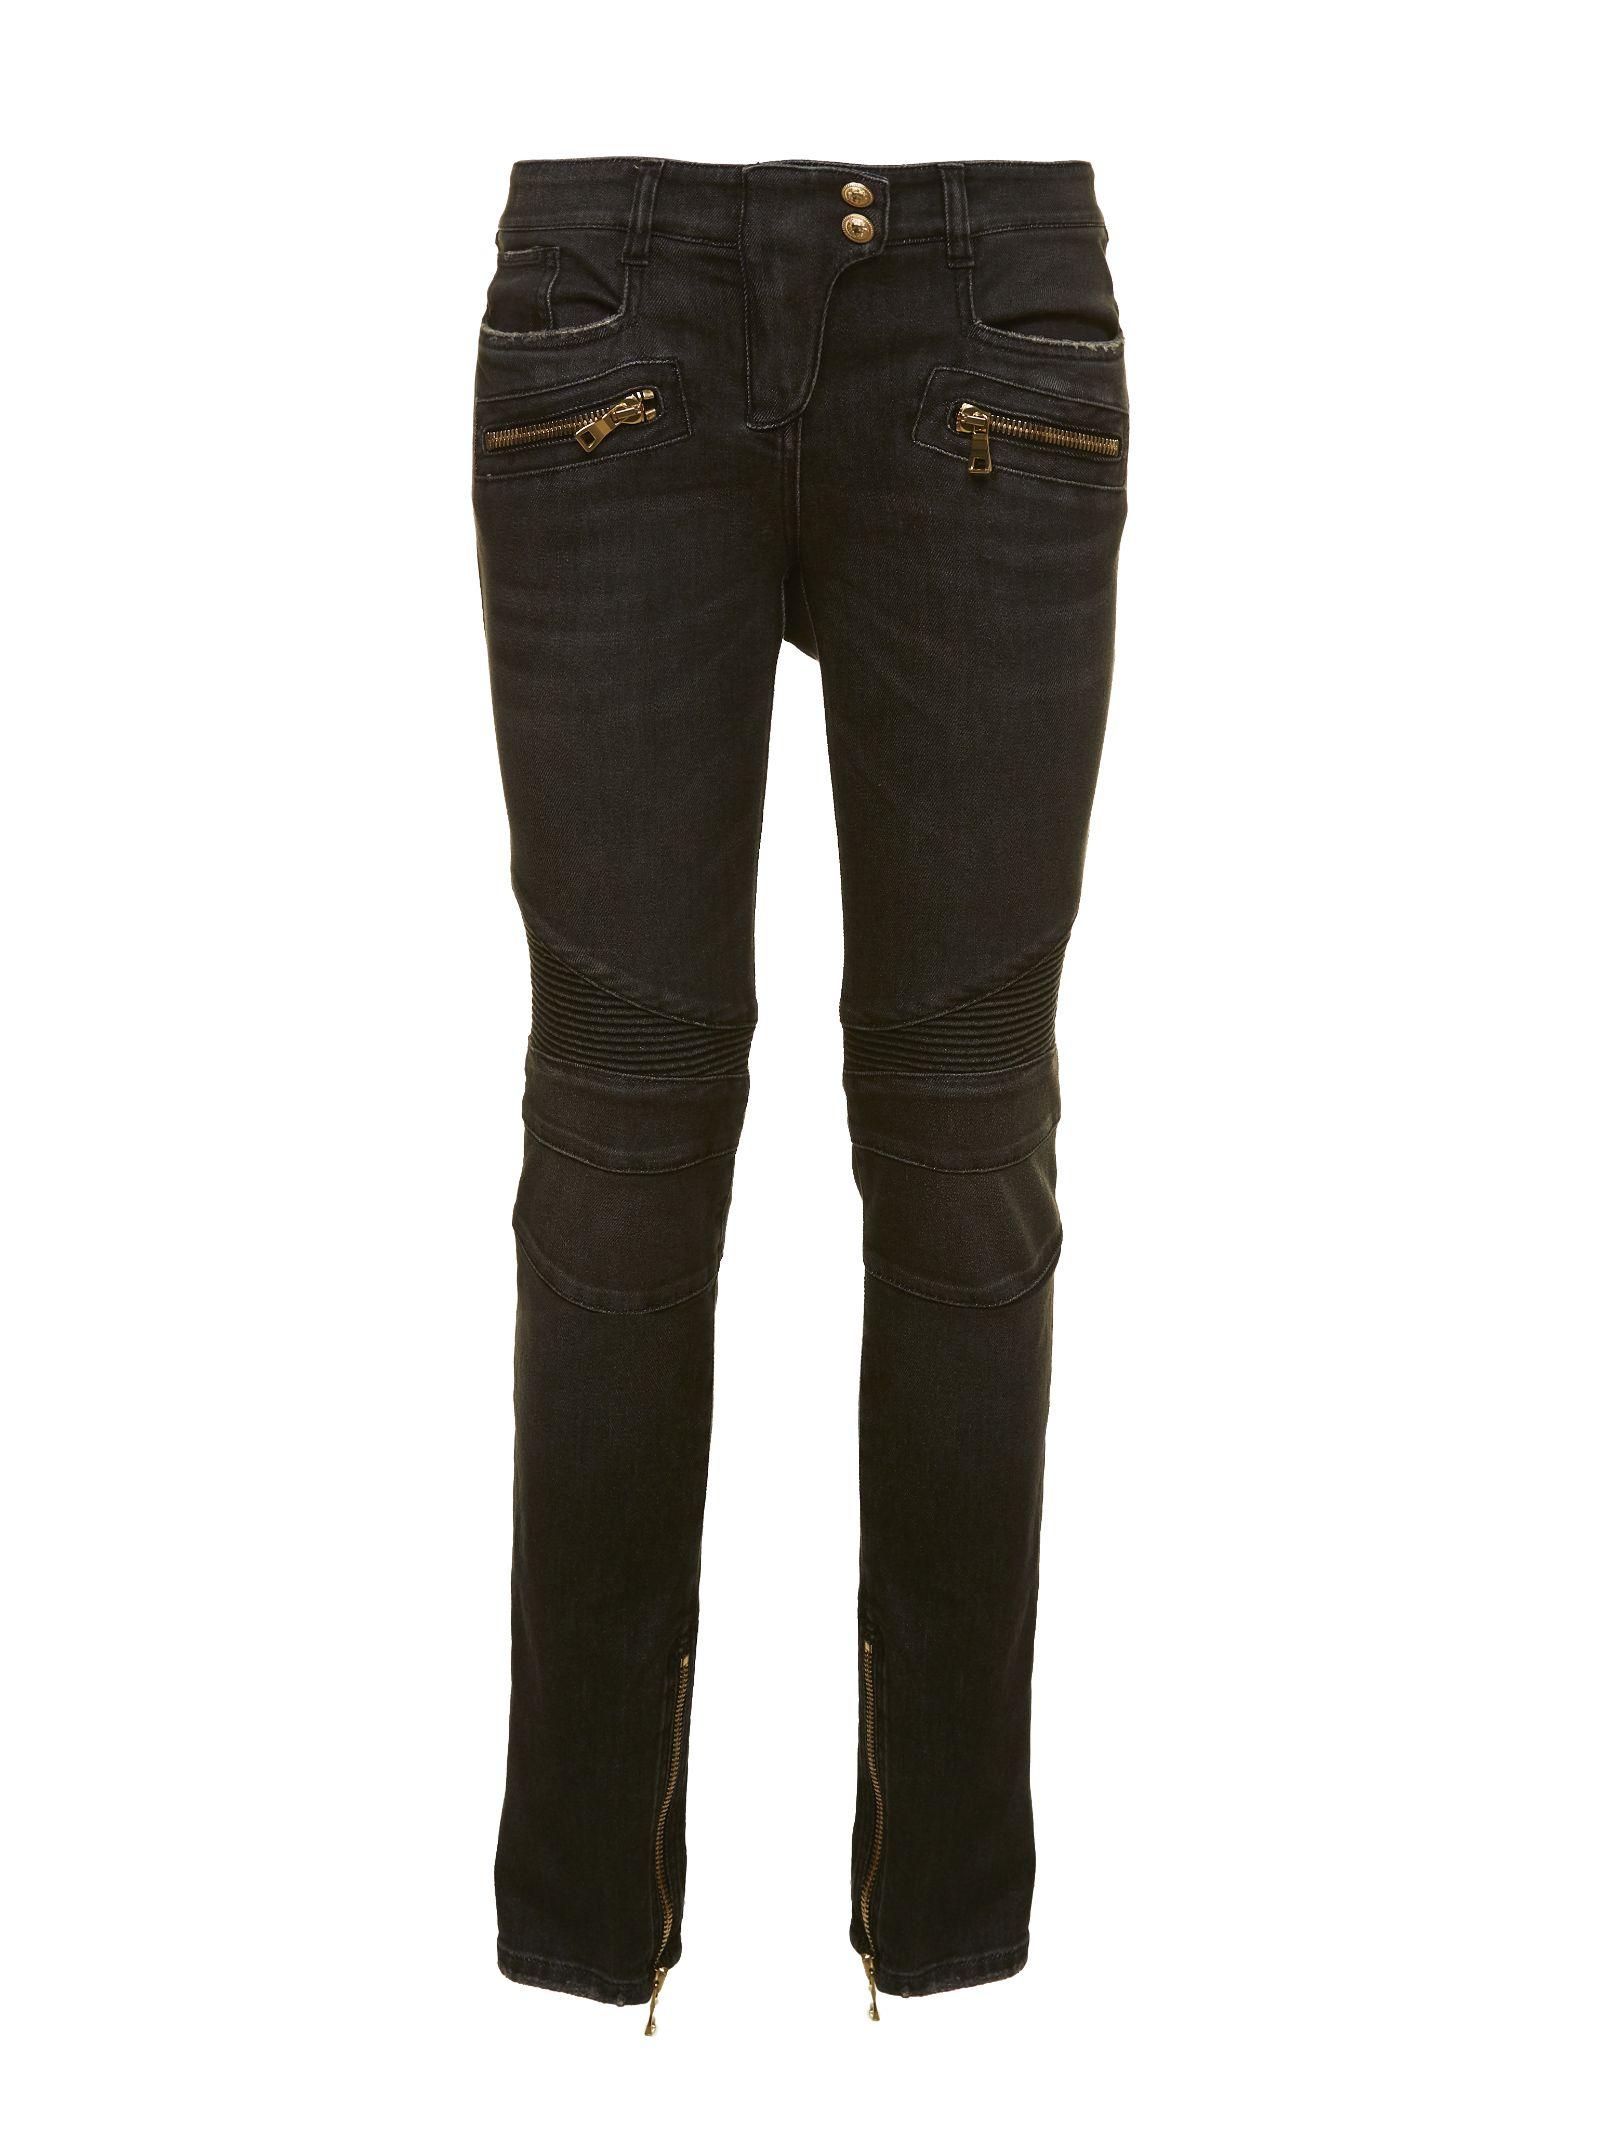 Balmain Zip Jeans